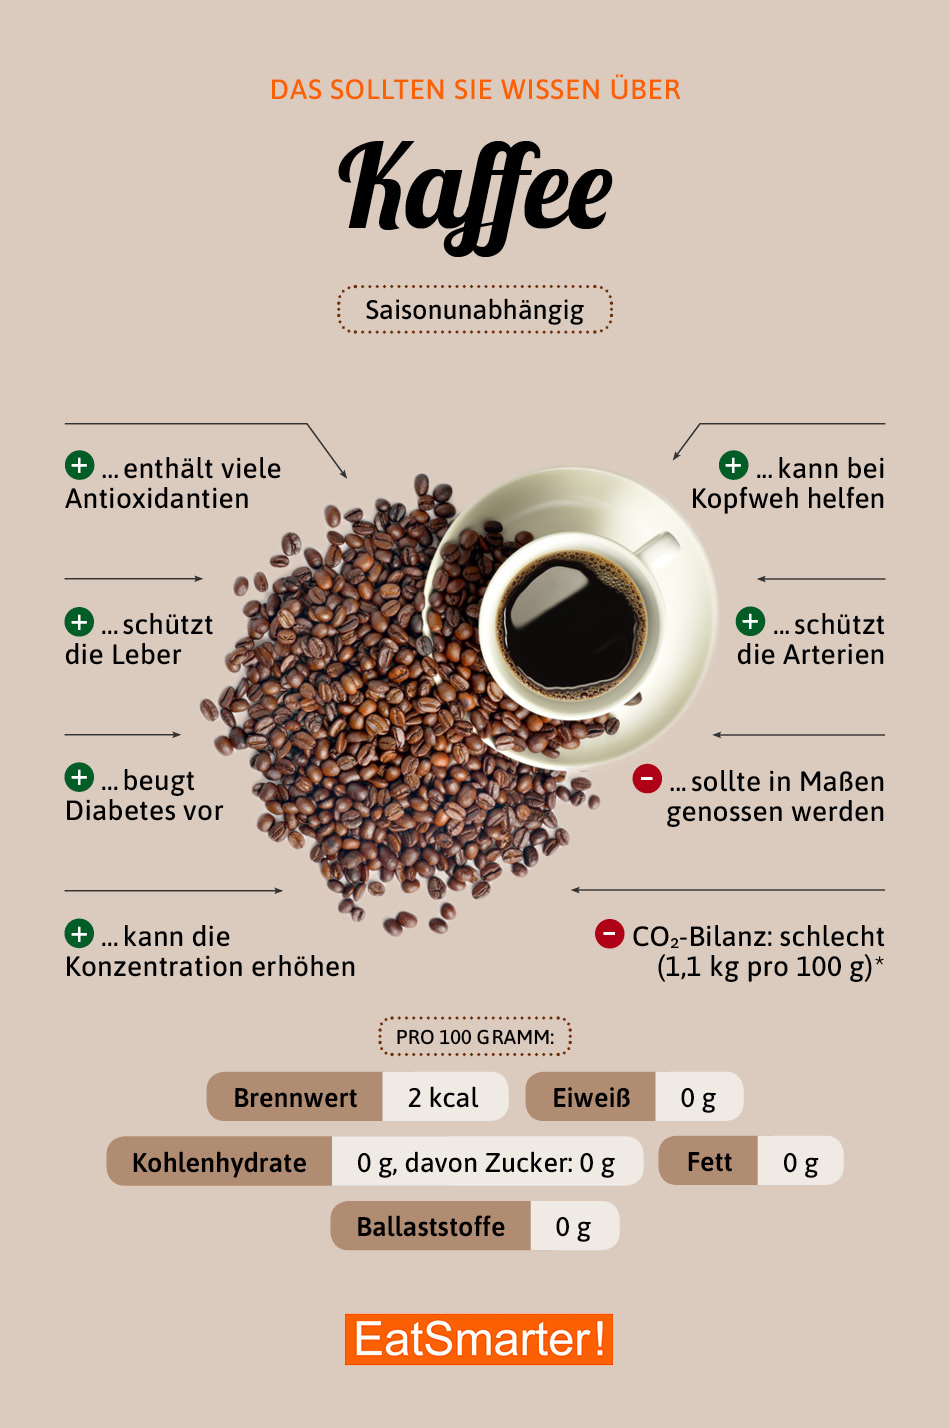 Warenkunde Kaffee Infografik